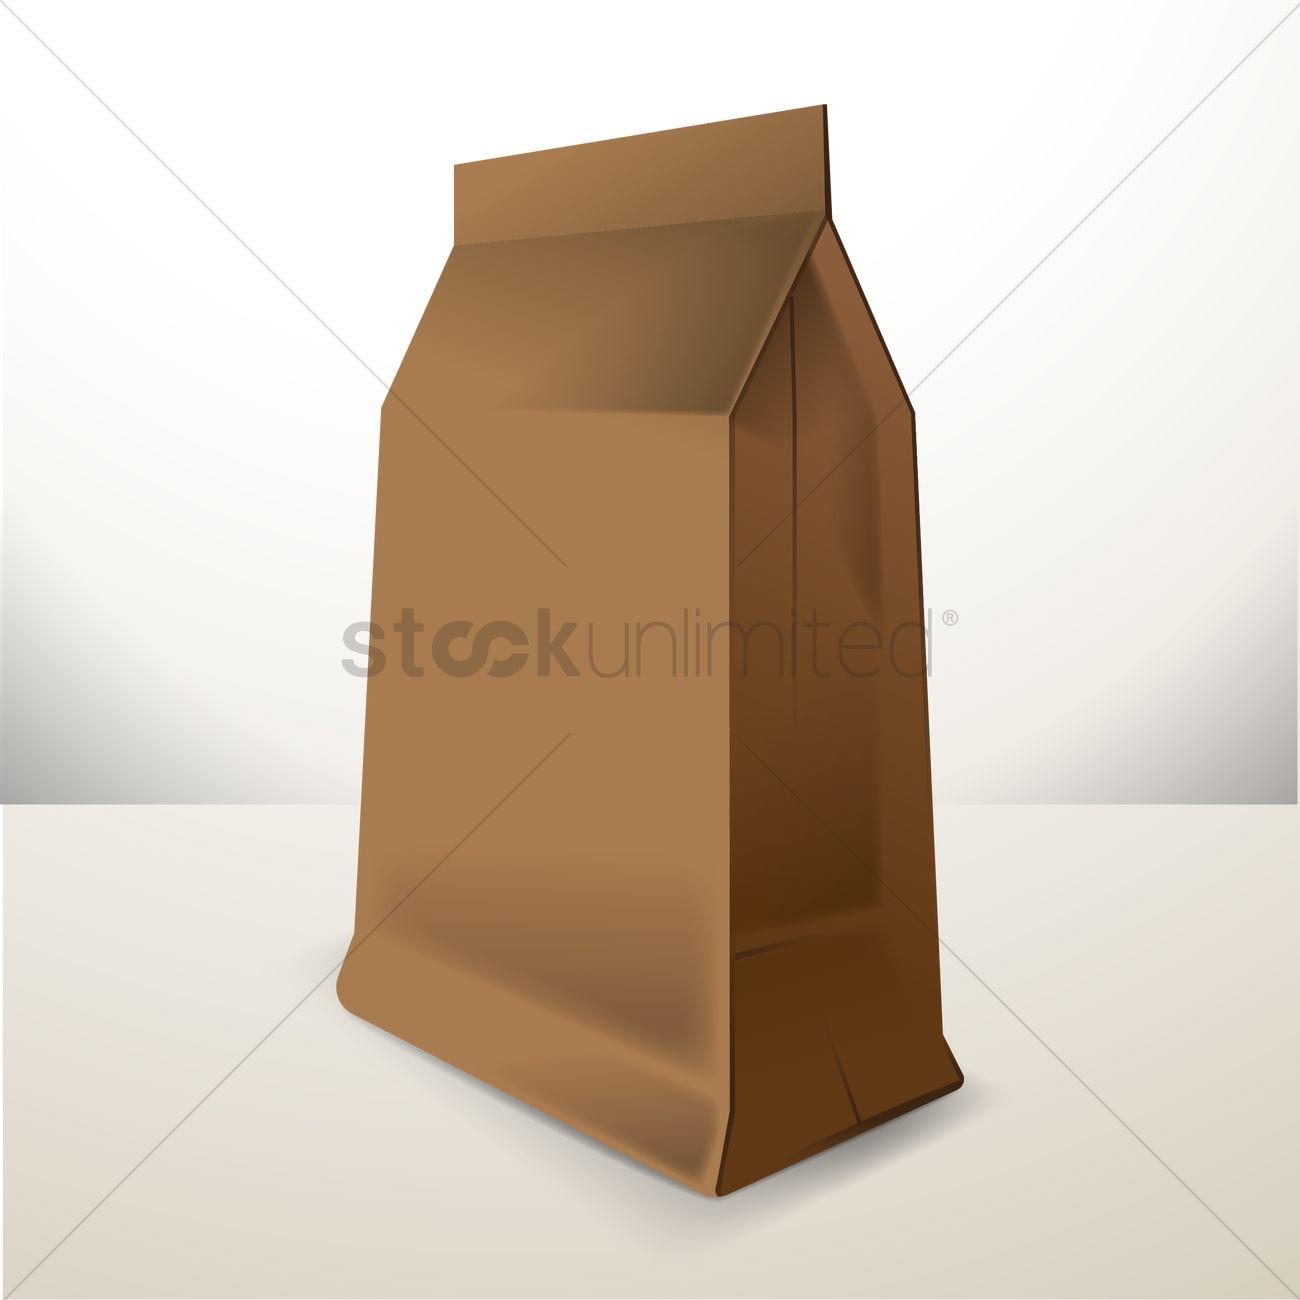 Paper bag vector - Brown Paper Bag Vector Graphic